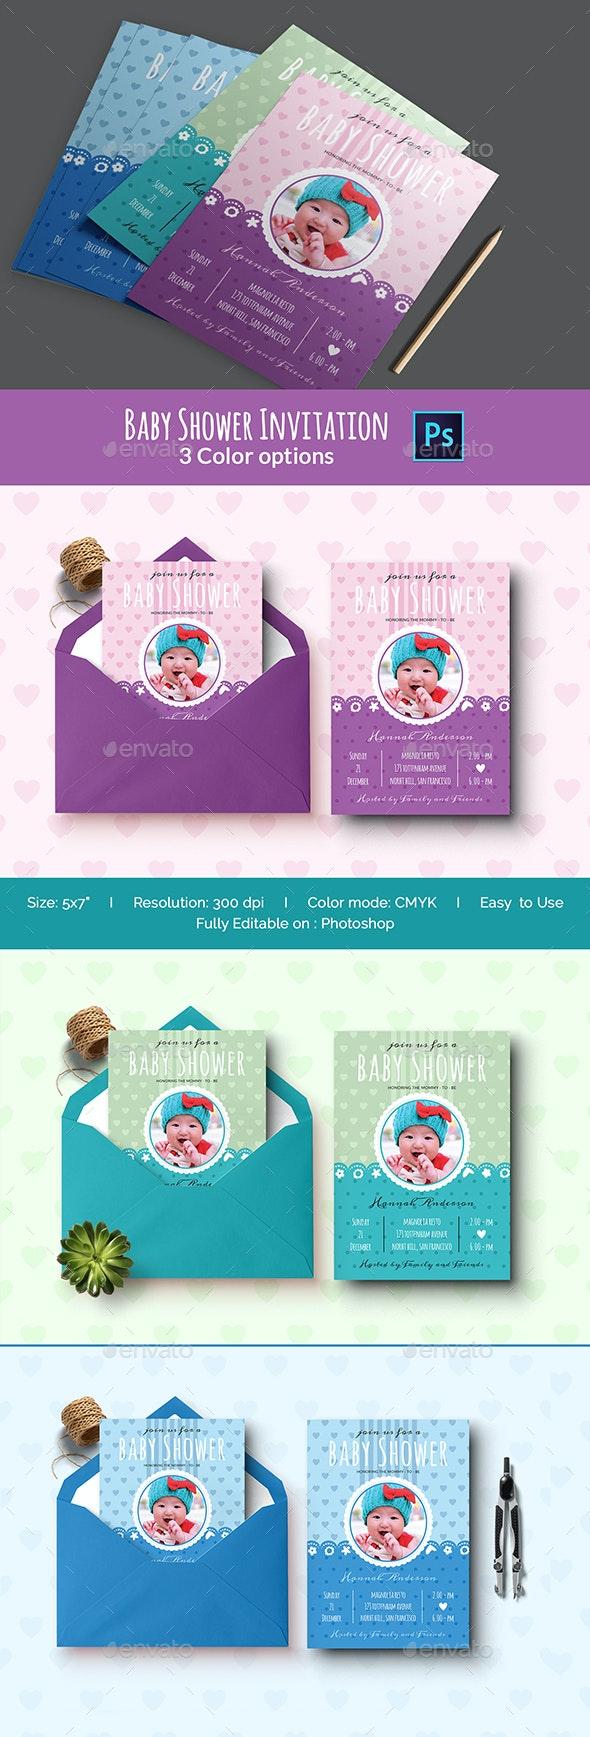 Baby Shower Invitation - Print Templates